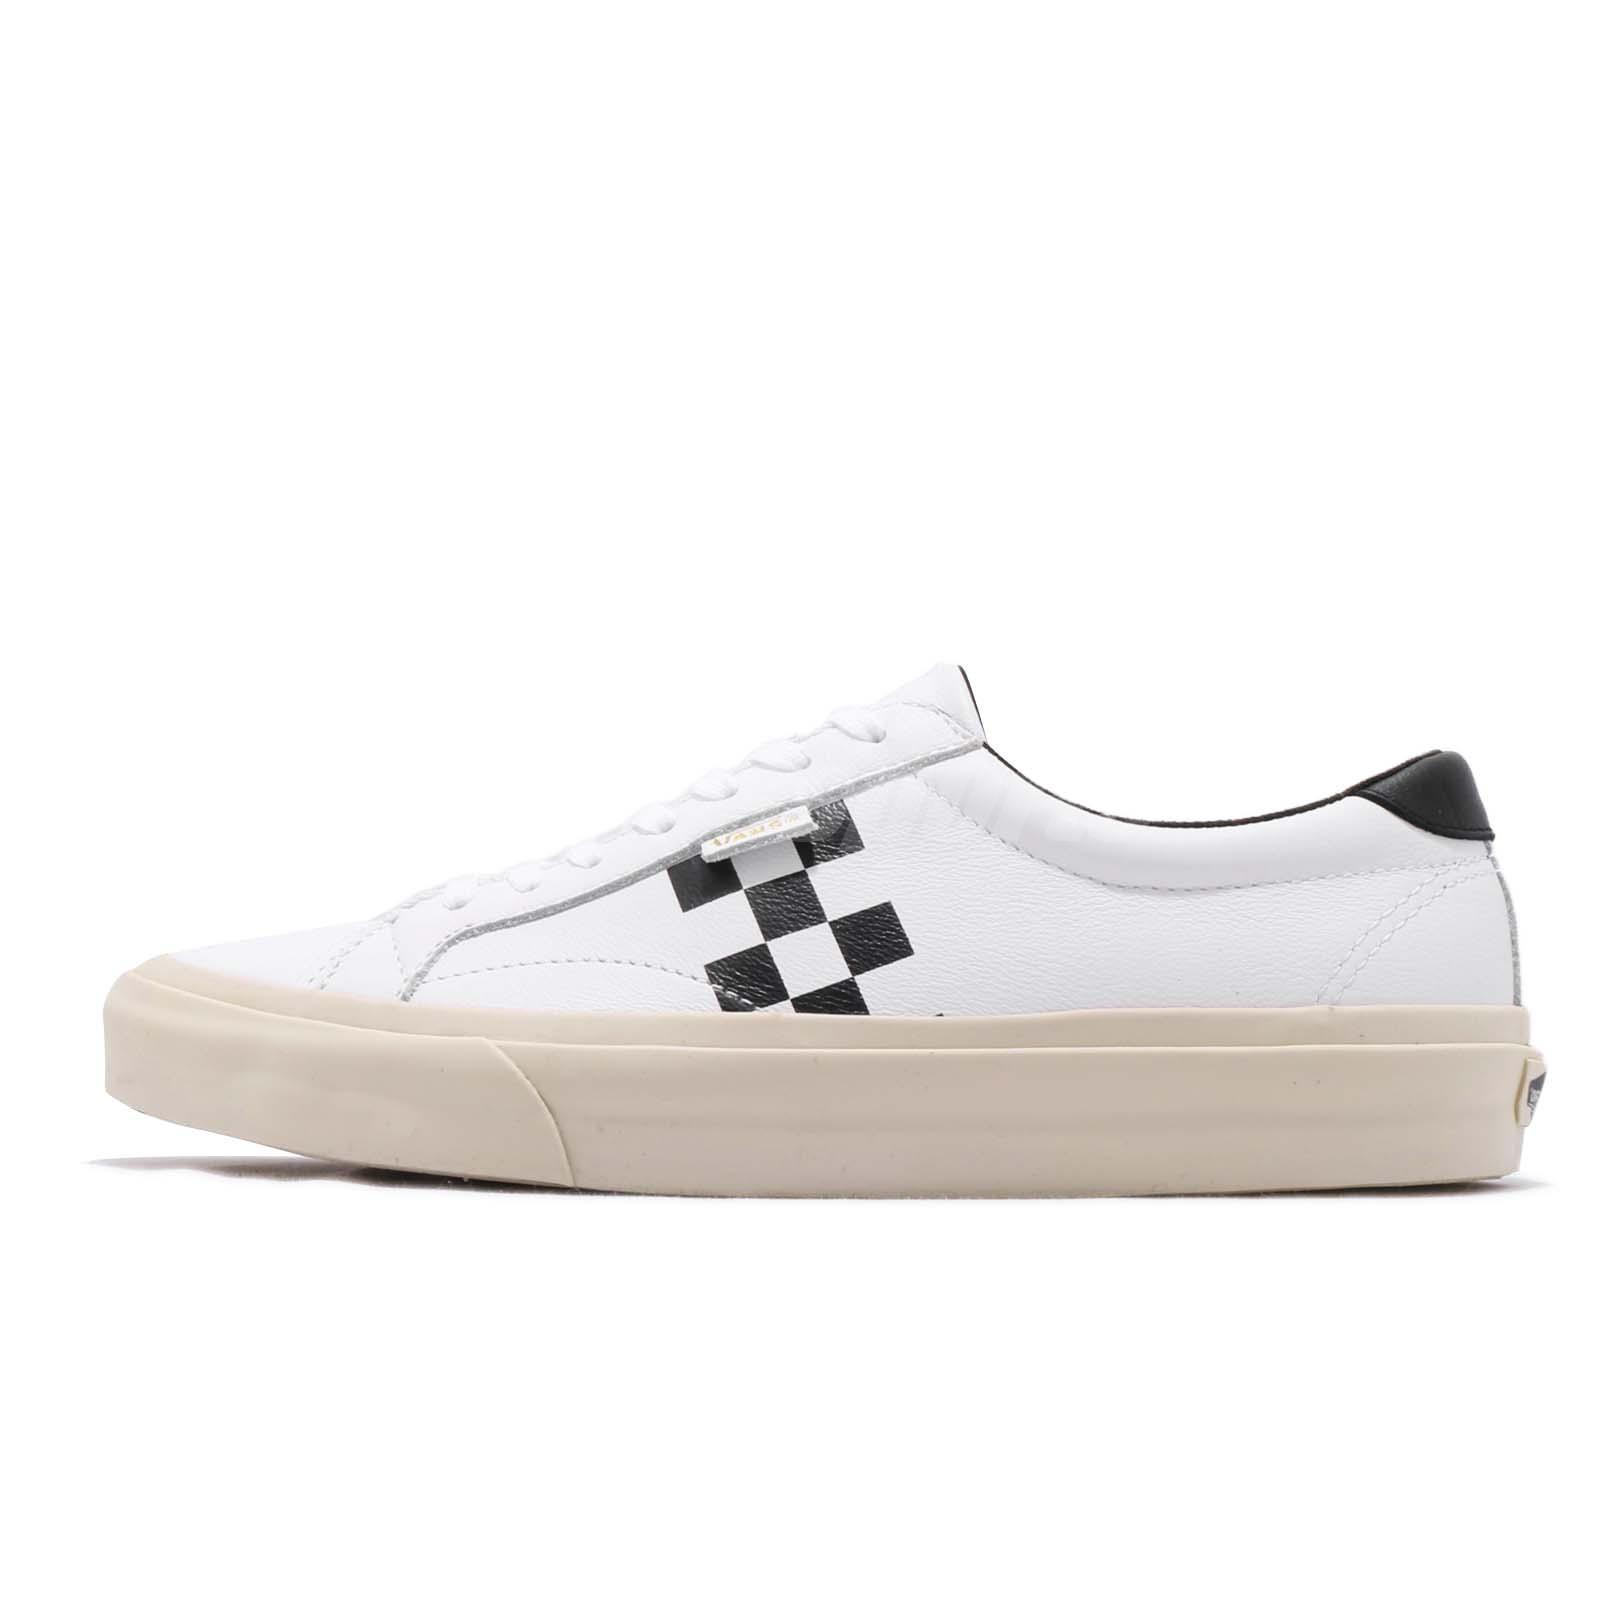 b0548d15cc7c Vans Court Checker T Black White Men Skate Boarding Shoes Sneakers  VN0A2Z5NQFD